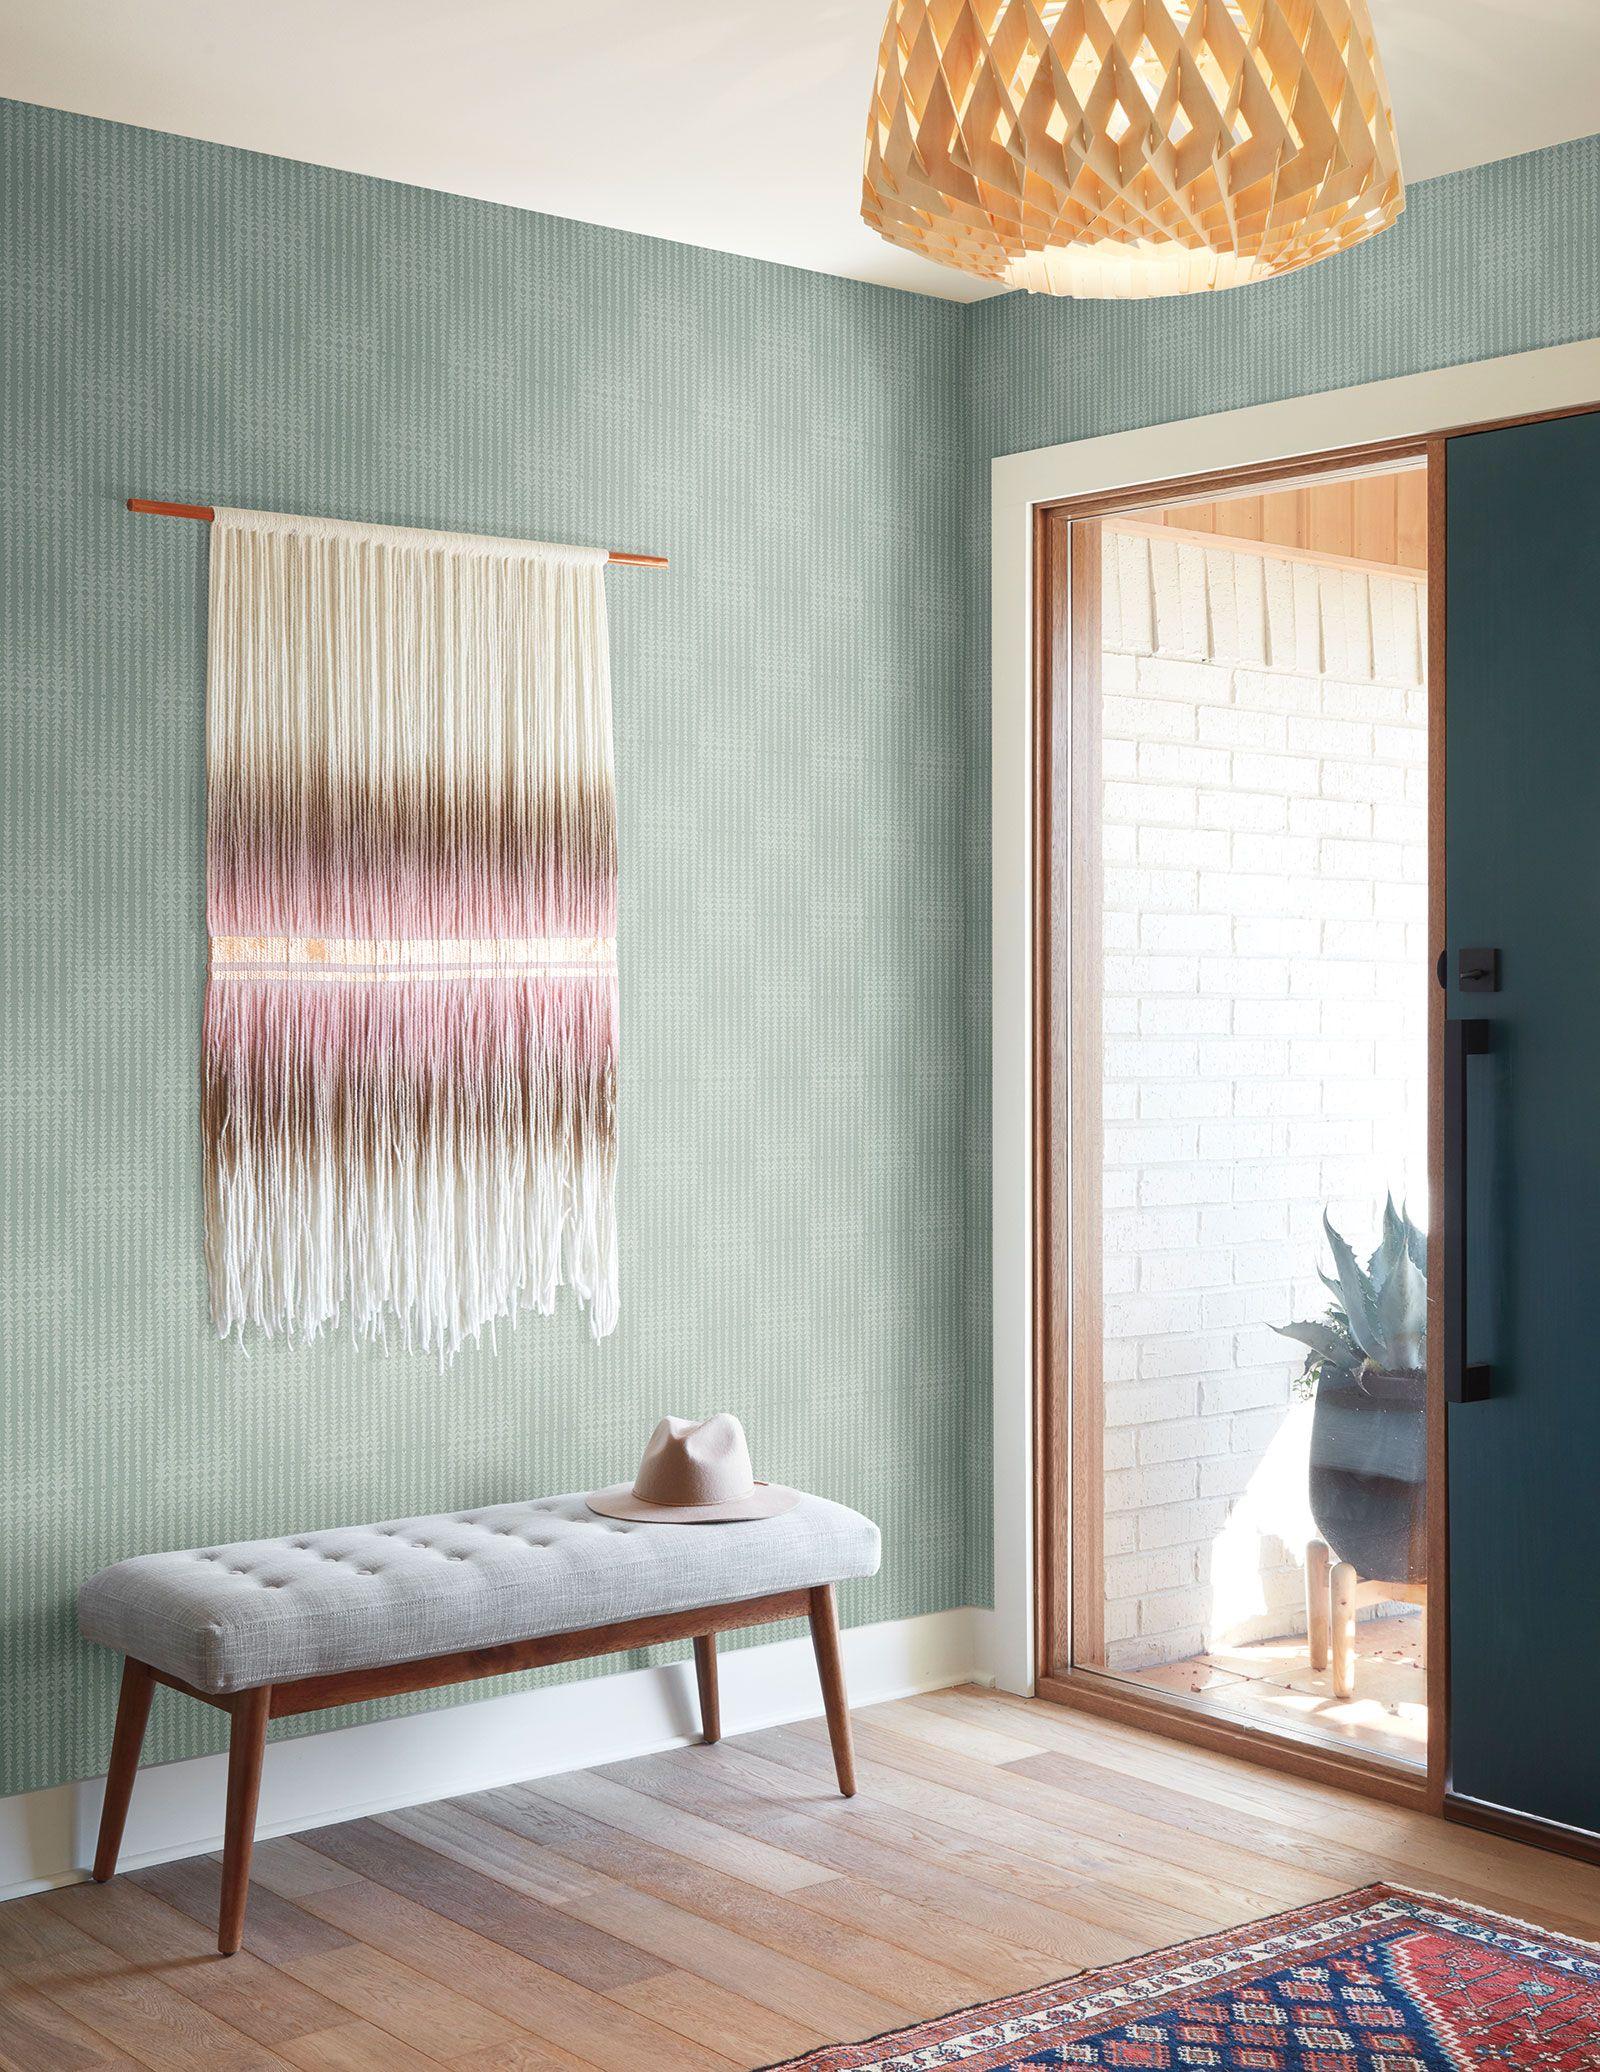 Magnolia Home Vantage Point Wallpaper Blue/Green